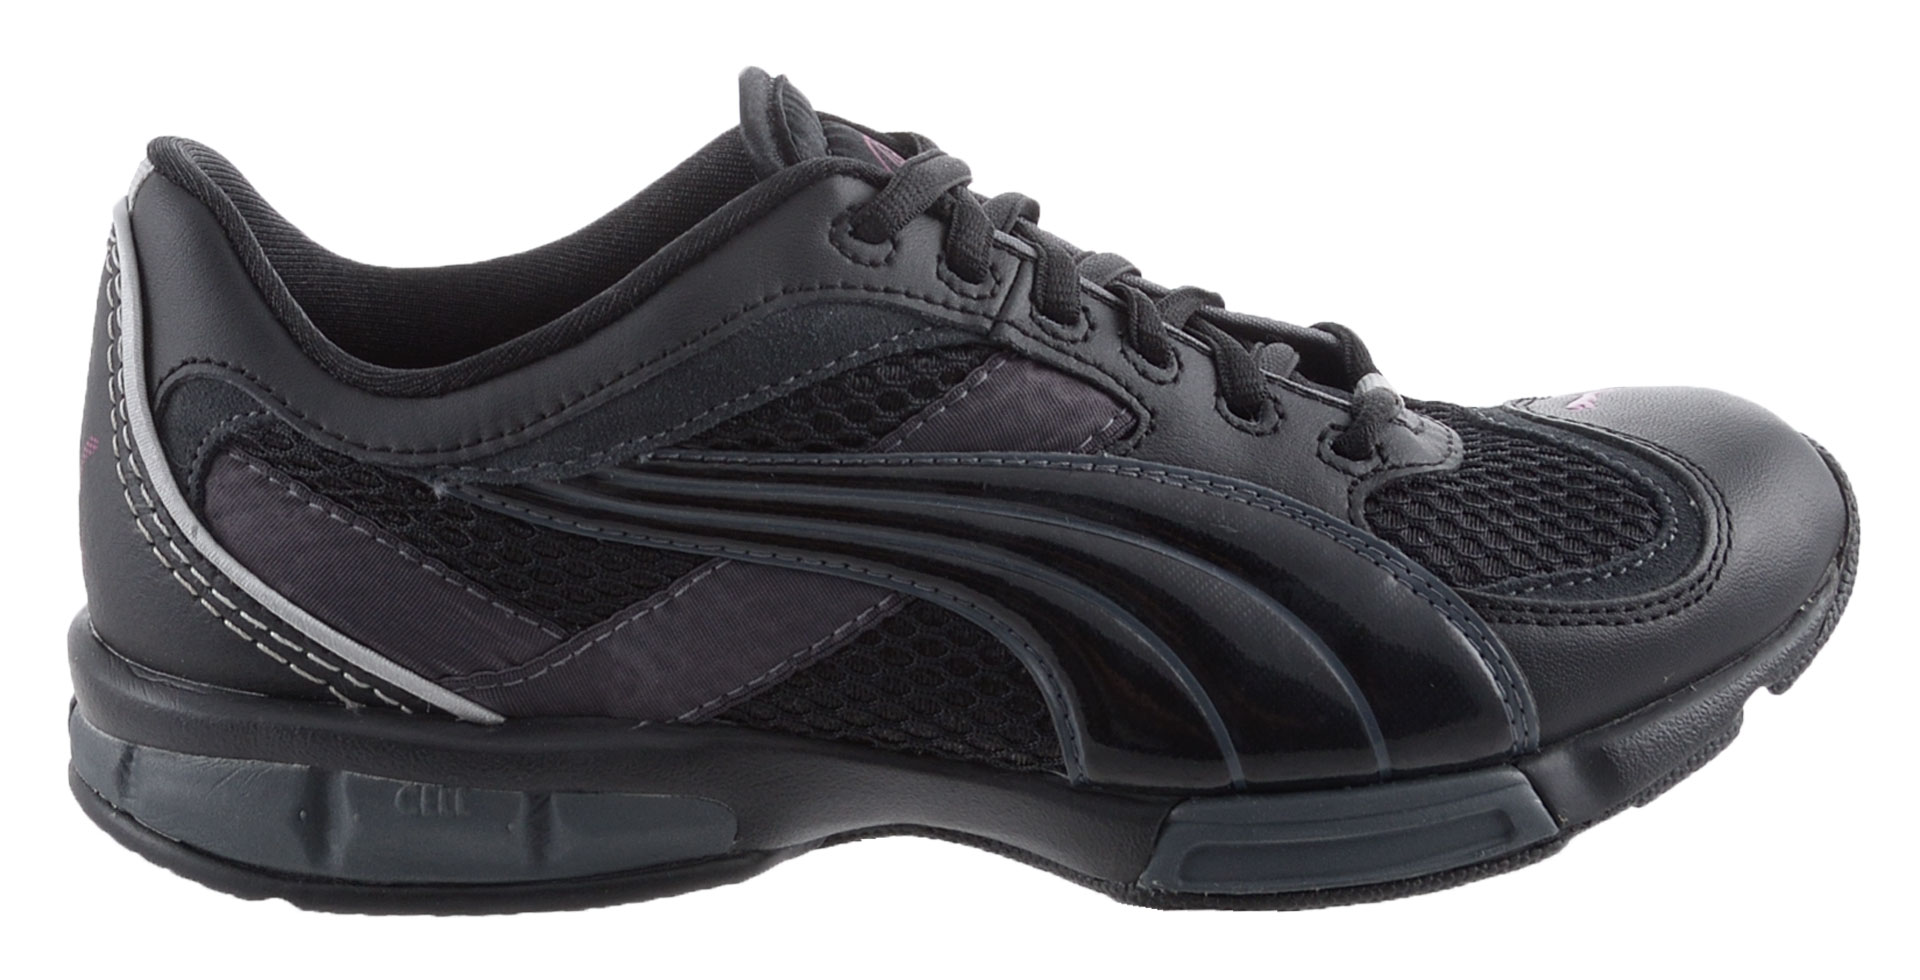 Puma Lutea NM Fitnessschoen Dames zwart